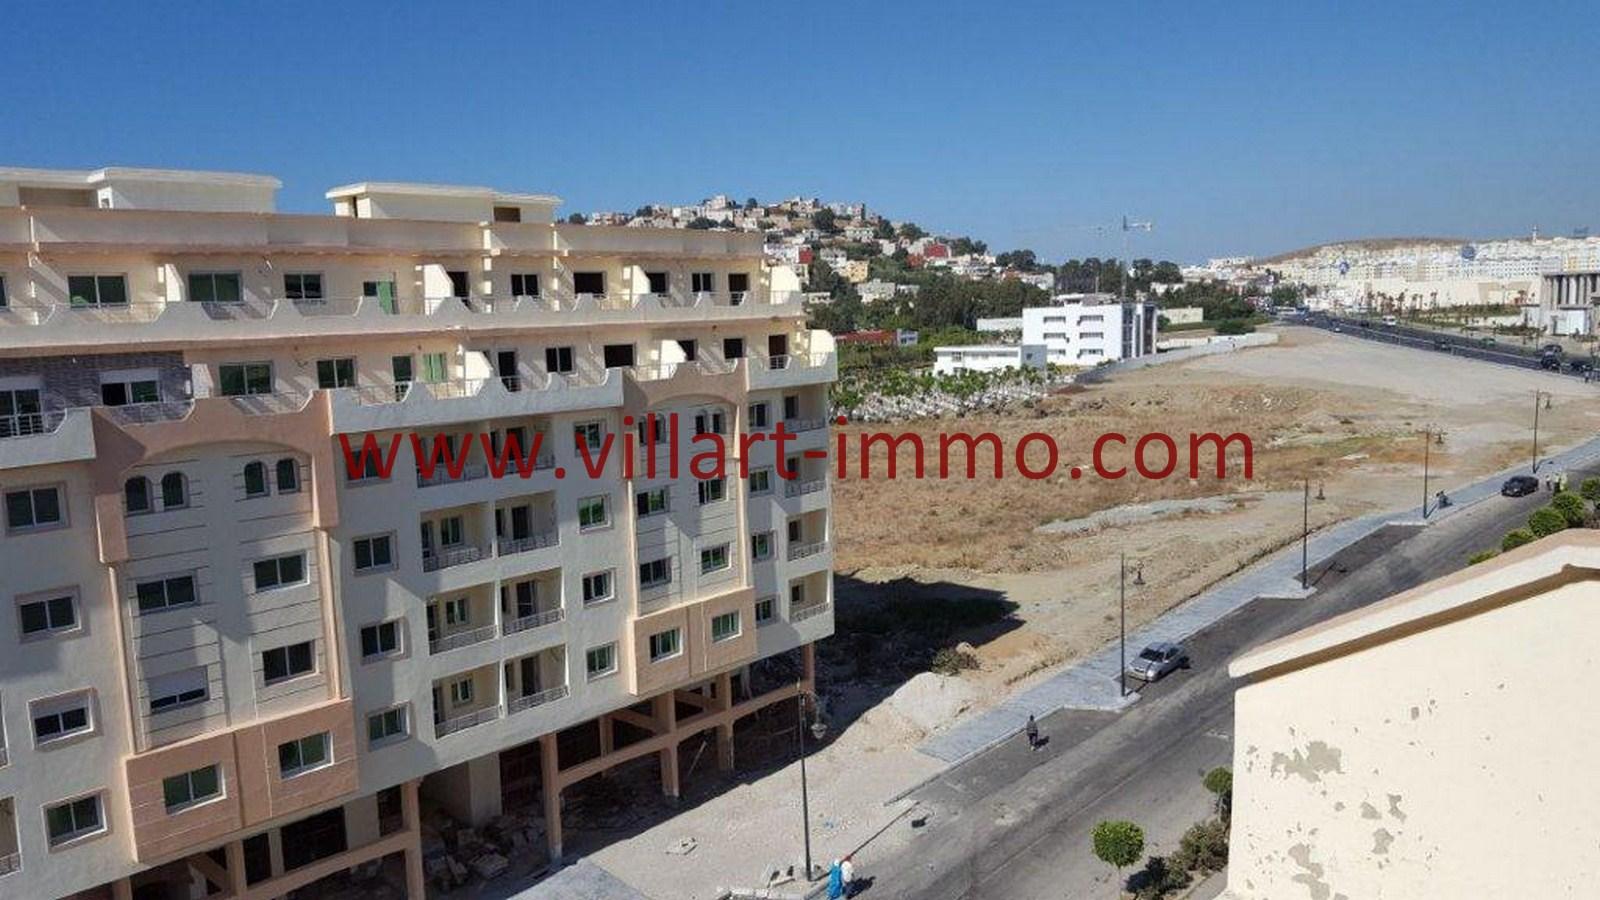 9-Vente-Appartement-Tanger-Vue-VA509-Villart Immo